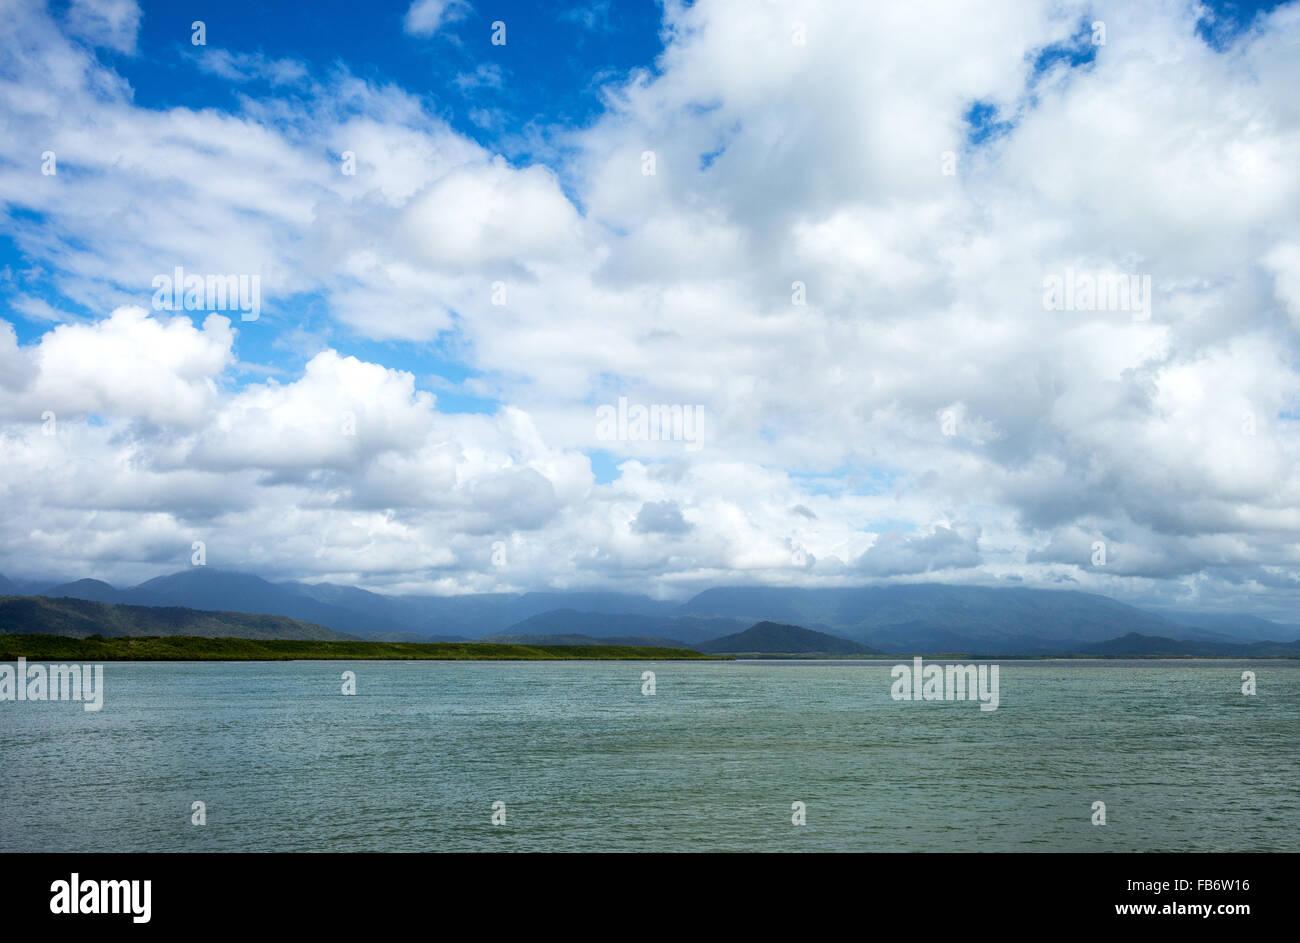 Australia, Queensland, Port Douglas, the sea view - Stock Image